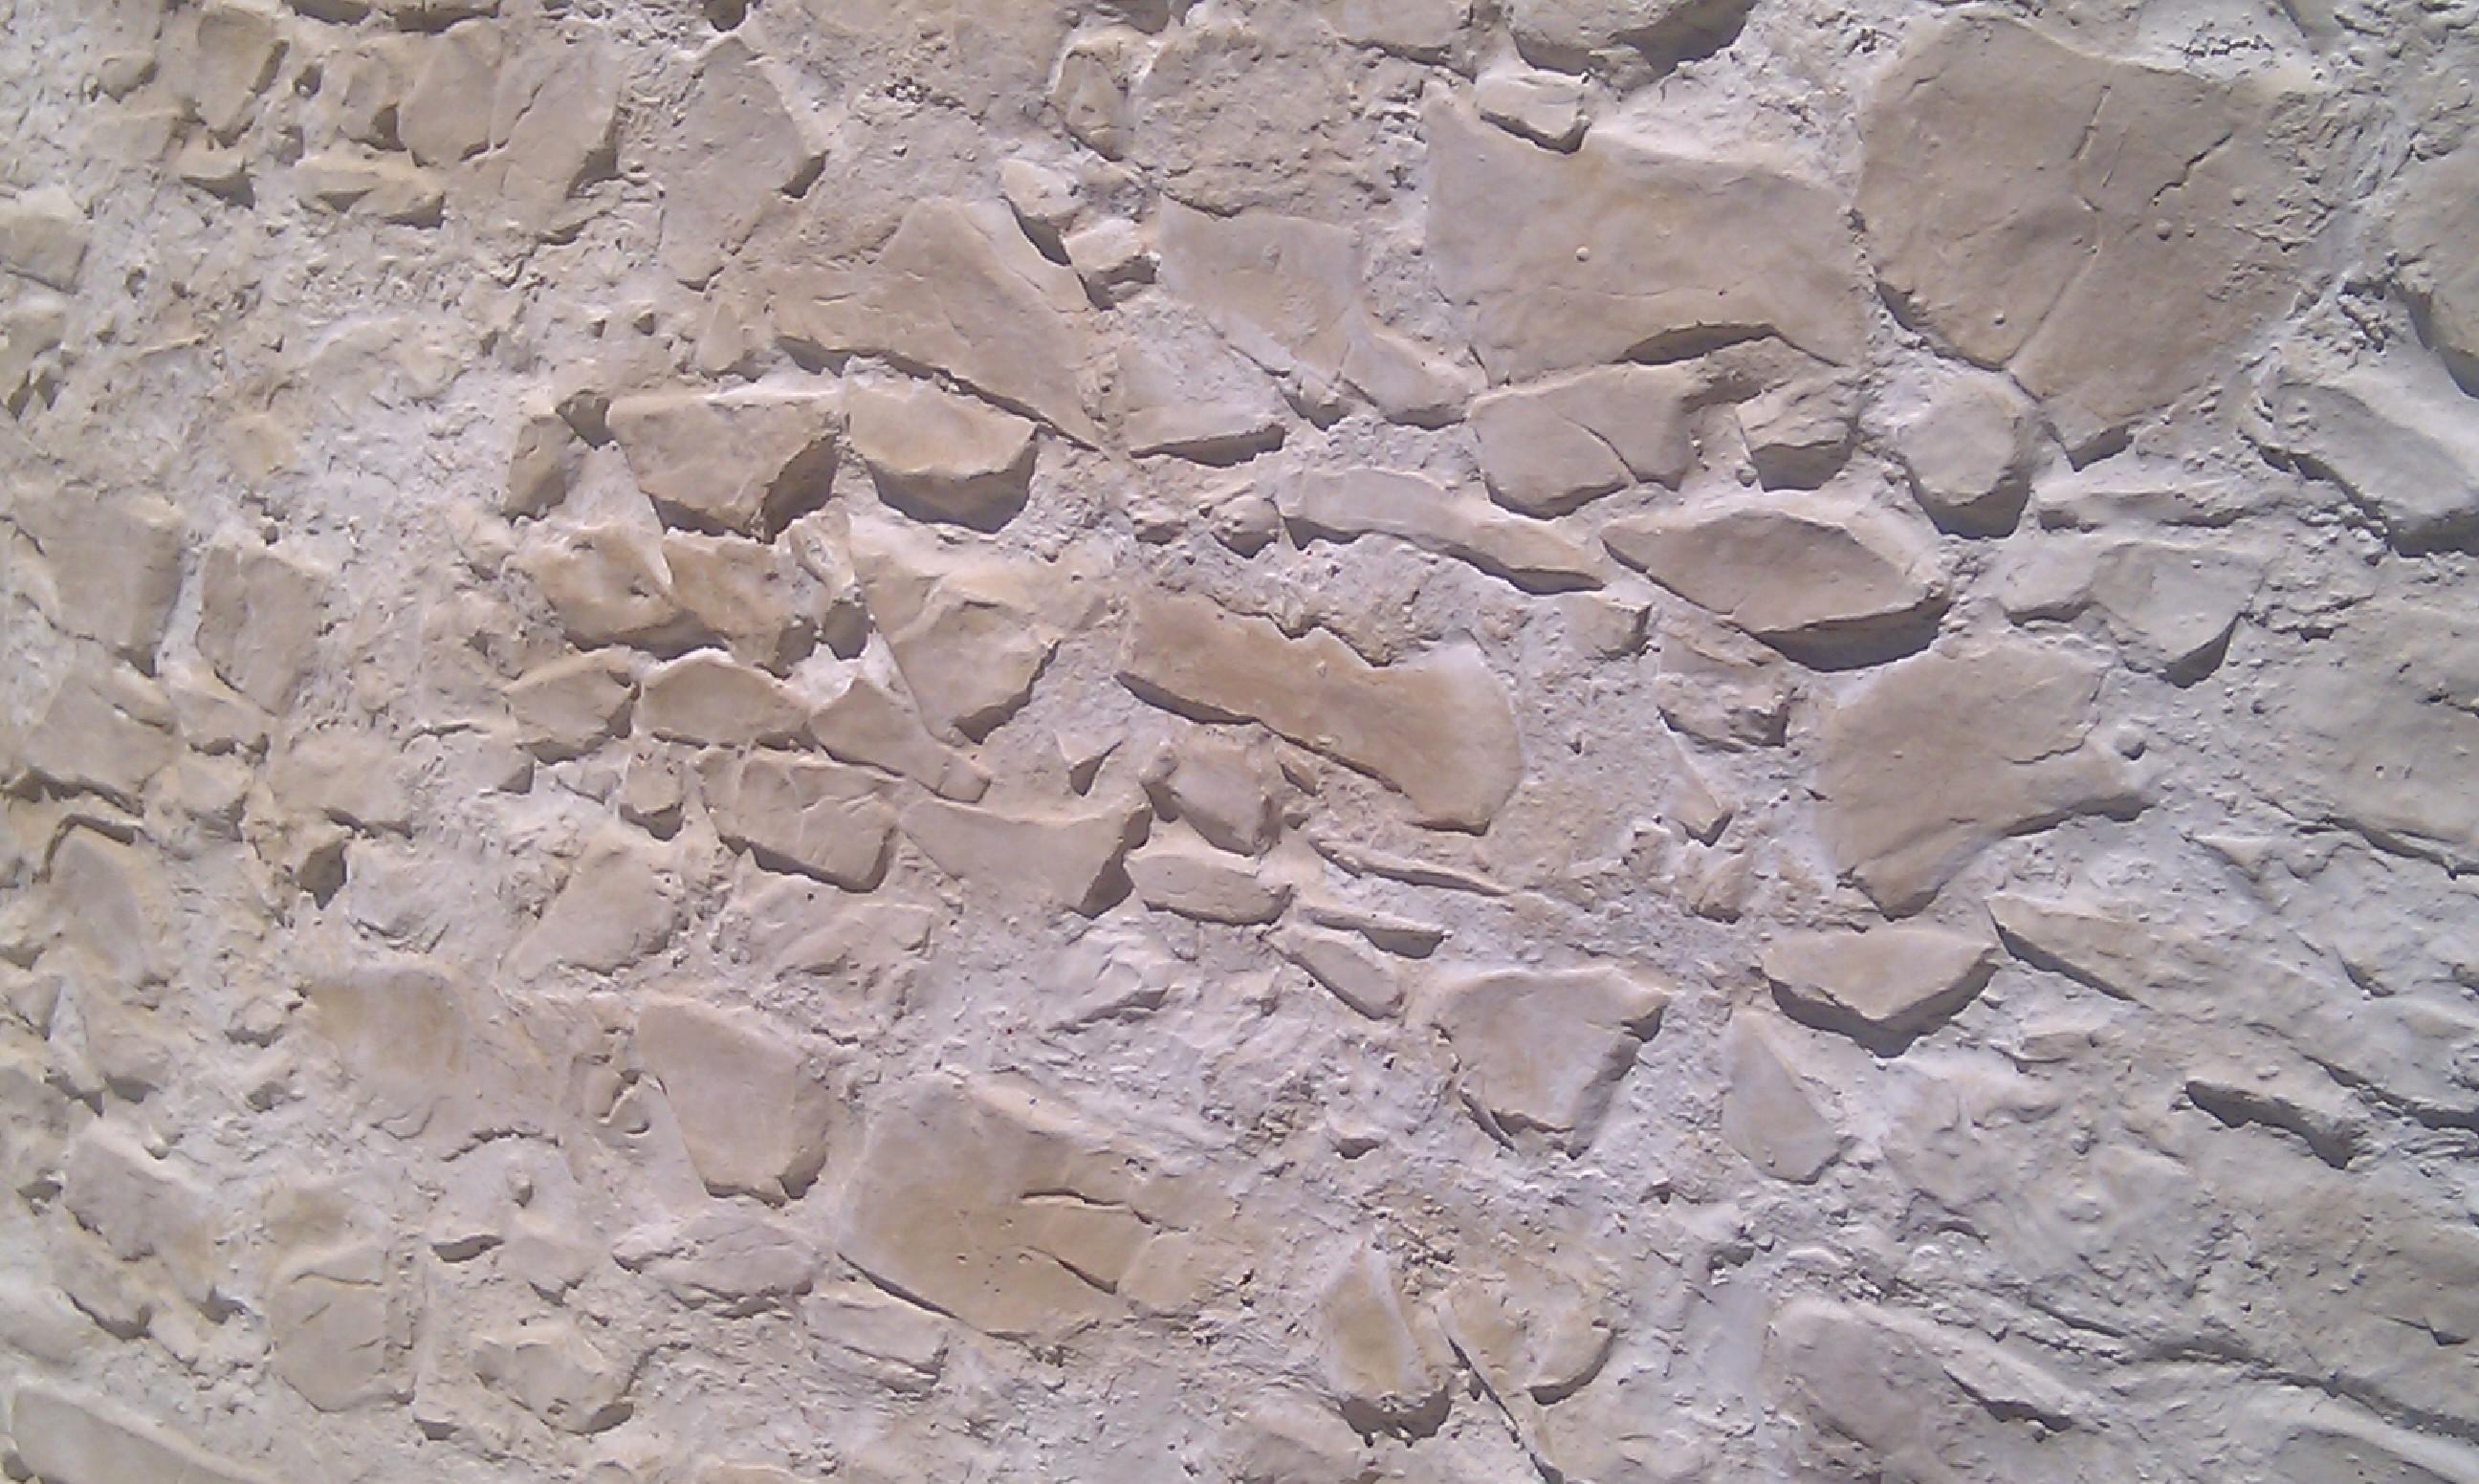 bar wohnzimmer wien:wohnzimmer bar traunstein : Felsenwand, Felsenbau, Kunstfelsenbau